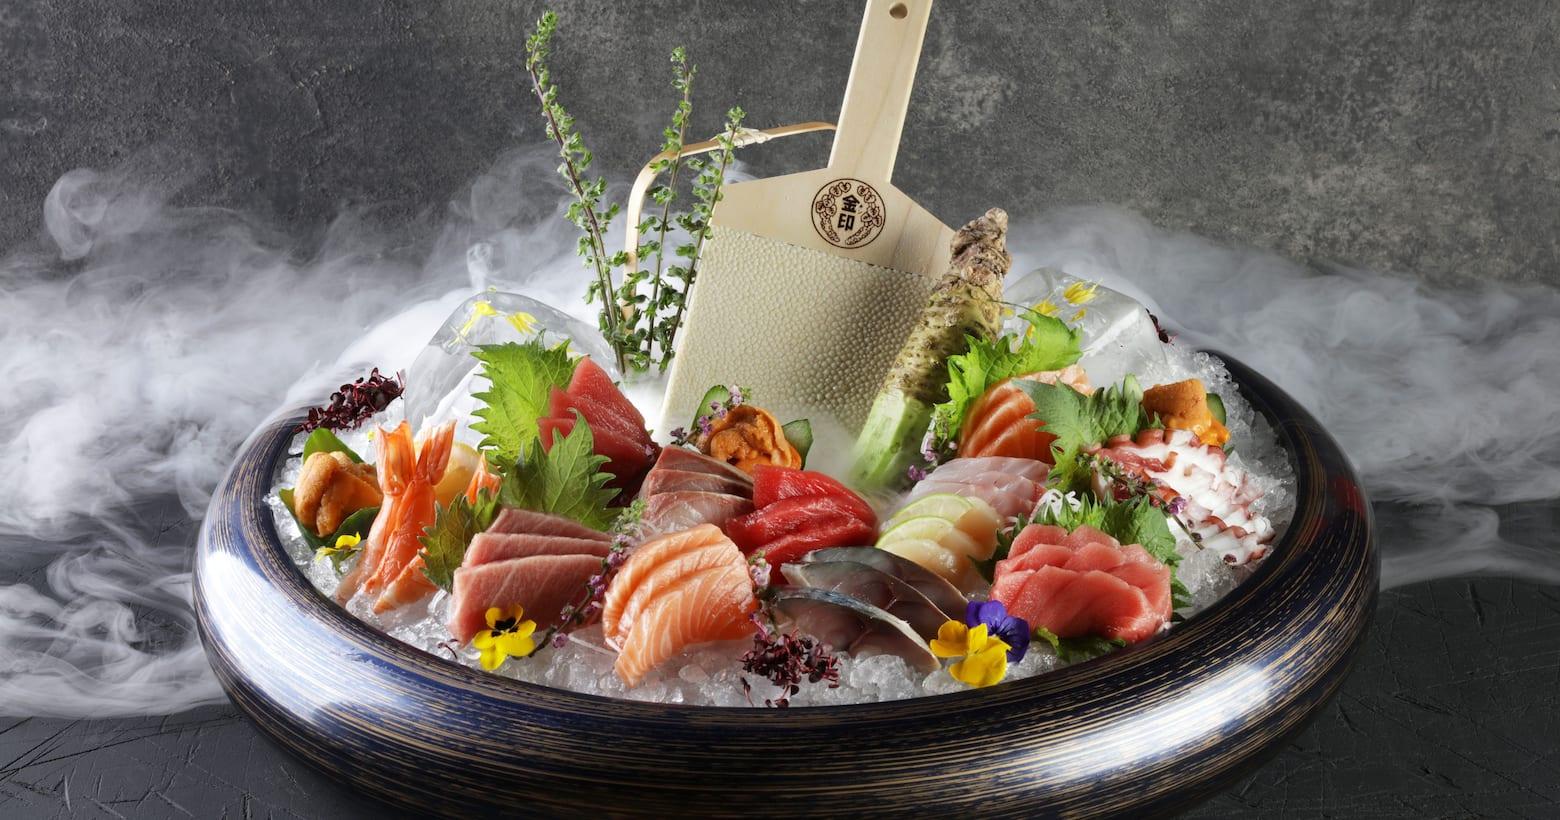 netsu food - sashimi on ice